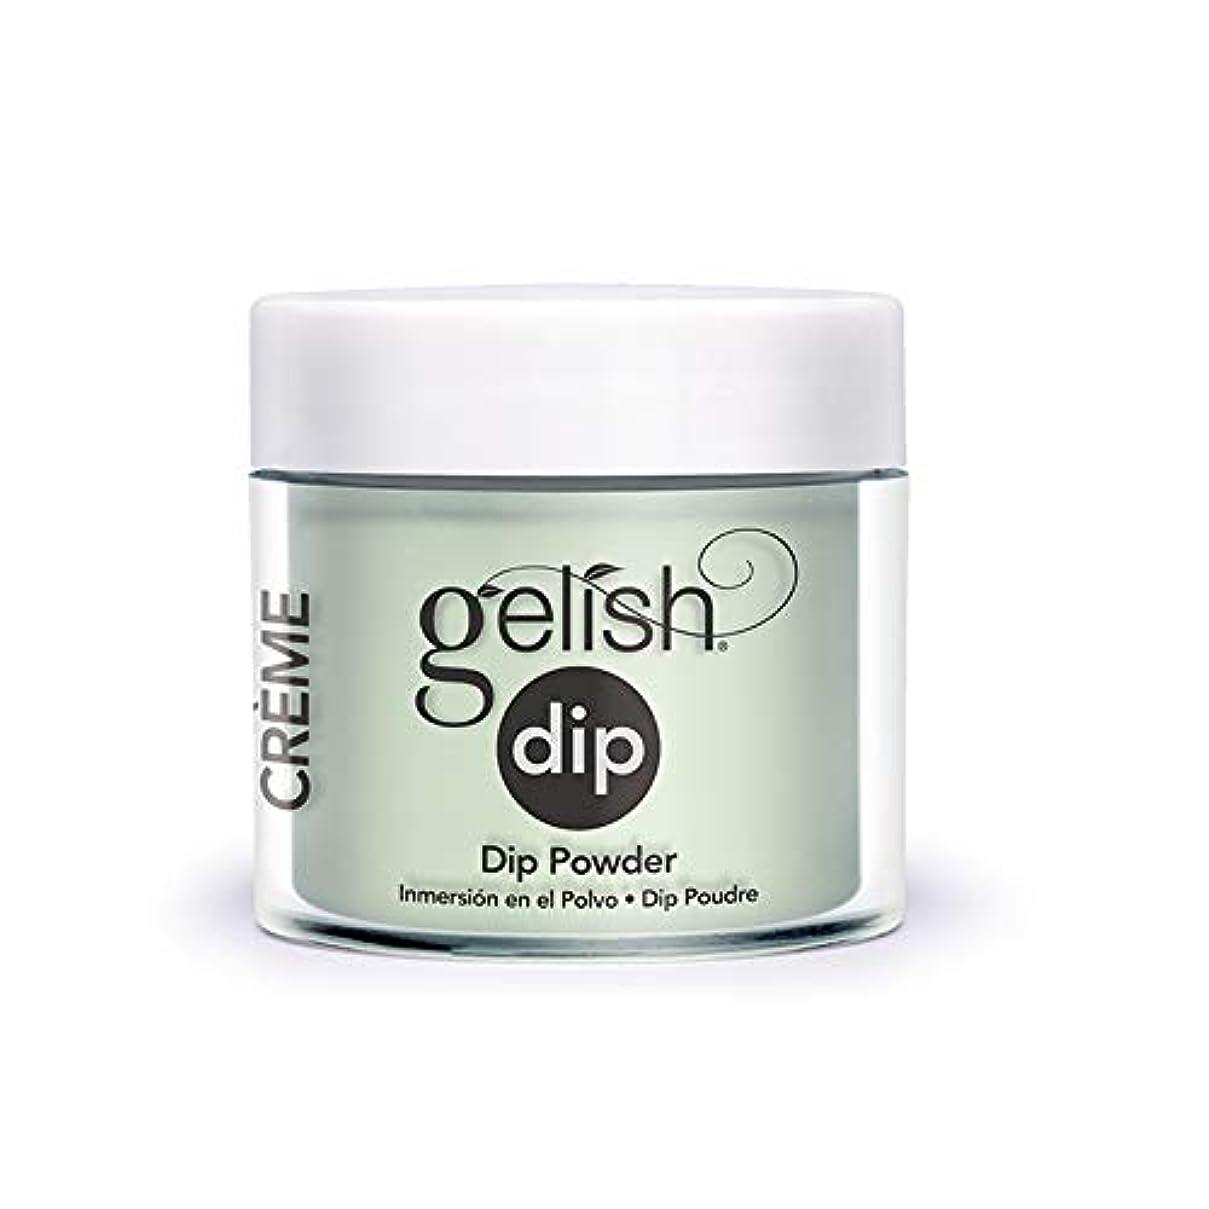 ガス受取人描写Harmony Gelish - Acrylic Dip Powder - Mint Chocolate Chip - 23g / 0.8oz